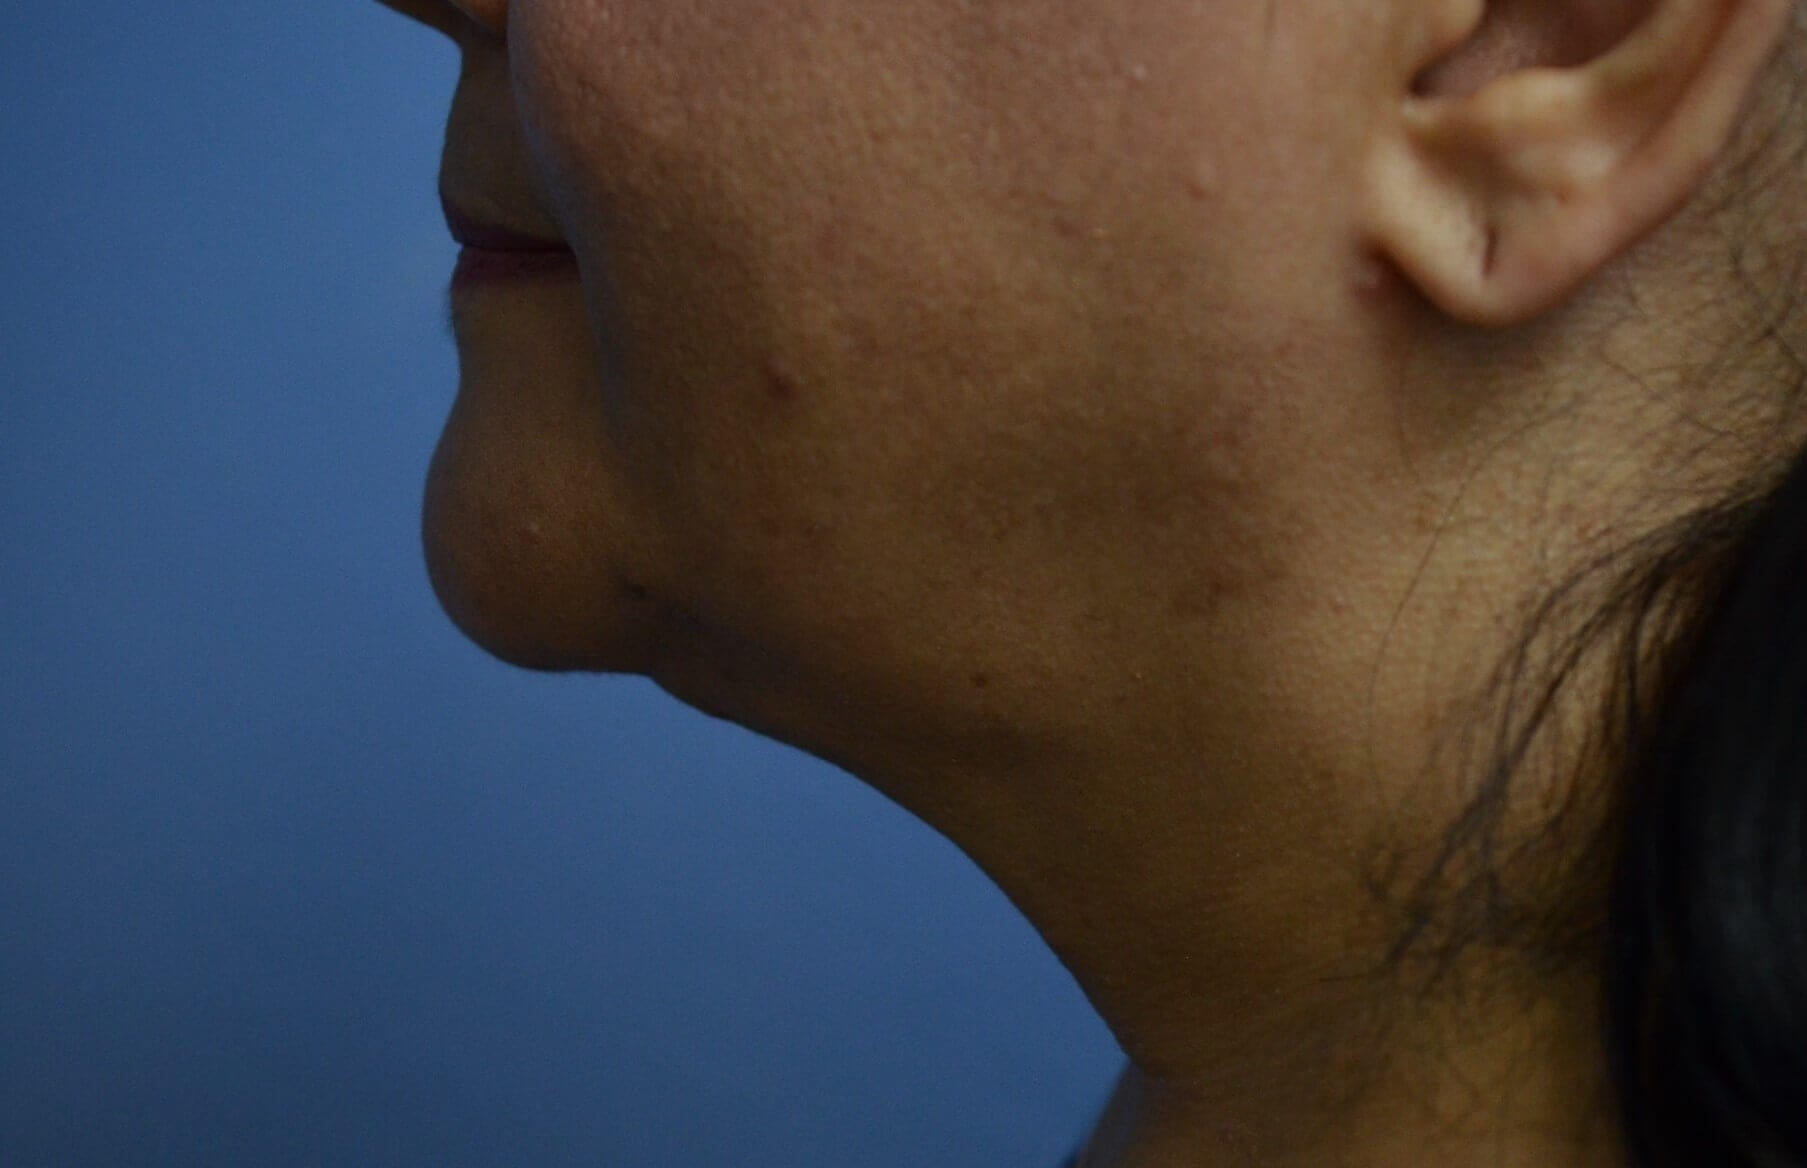 FaceTite procedure performed in McKinney, Texas